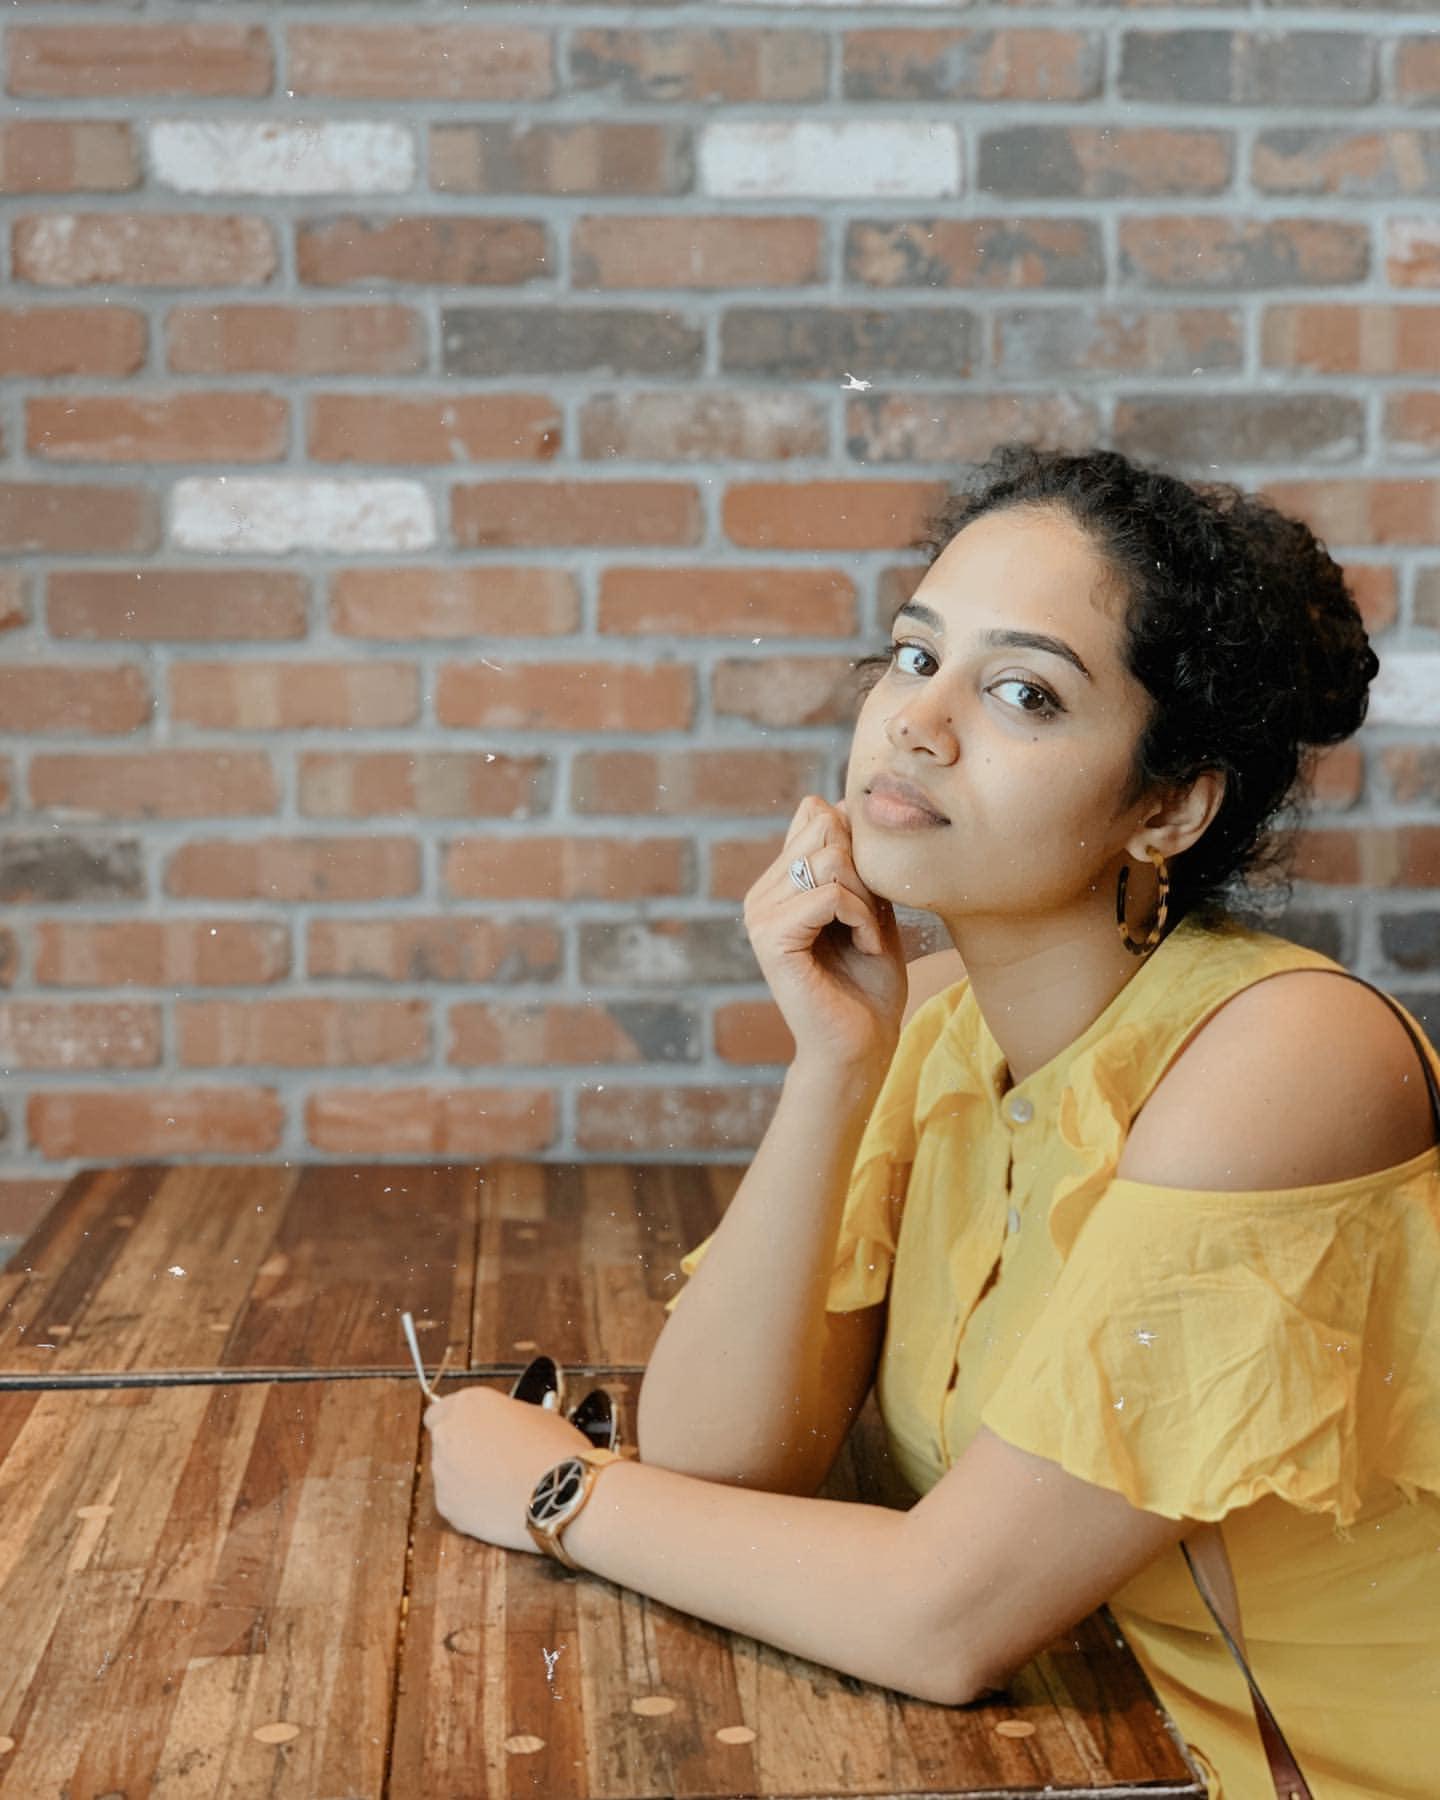 Manisha Eerabathini : సింగర్ మనీషా ఈరబత్తిని బ్యూటీఫుల్ పిక్స్ Photo : Instagram